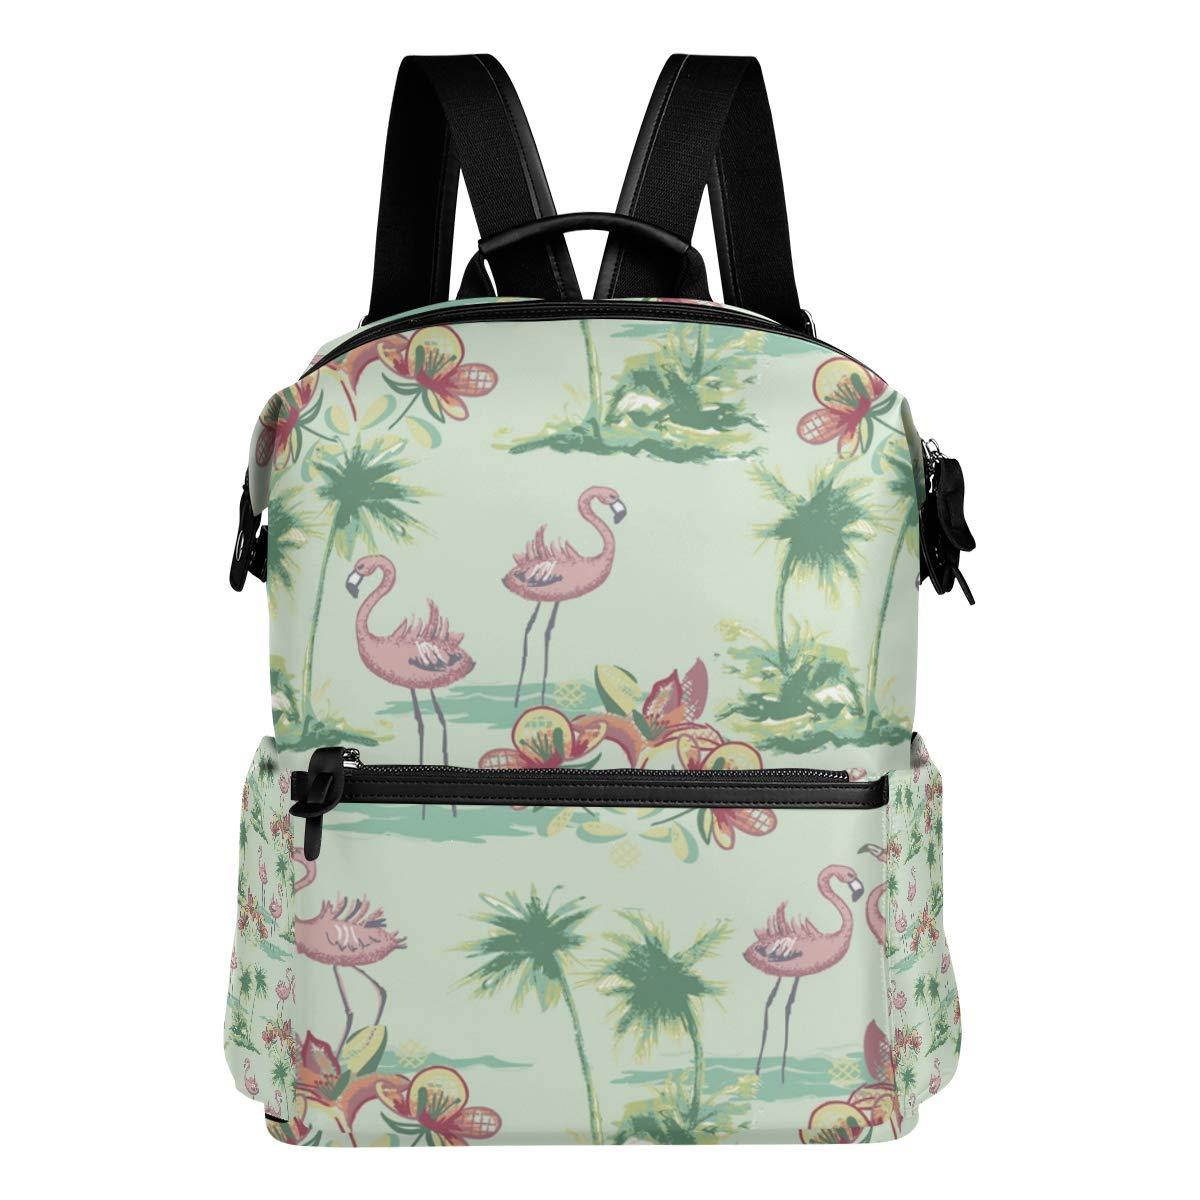 TIZORAX Mochila Floral Escolar Bolsas Colegio de Flamingo Bolsas de nnrx4Bg